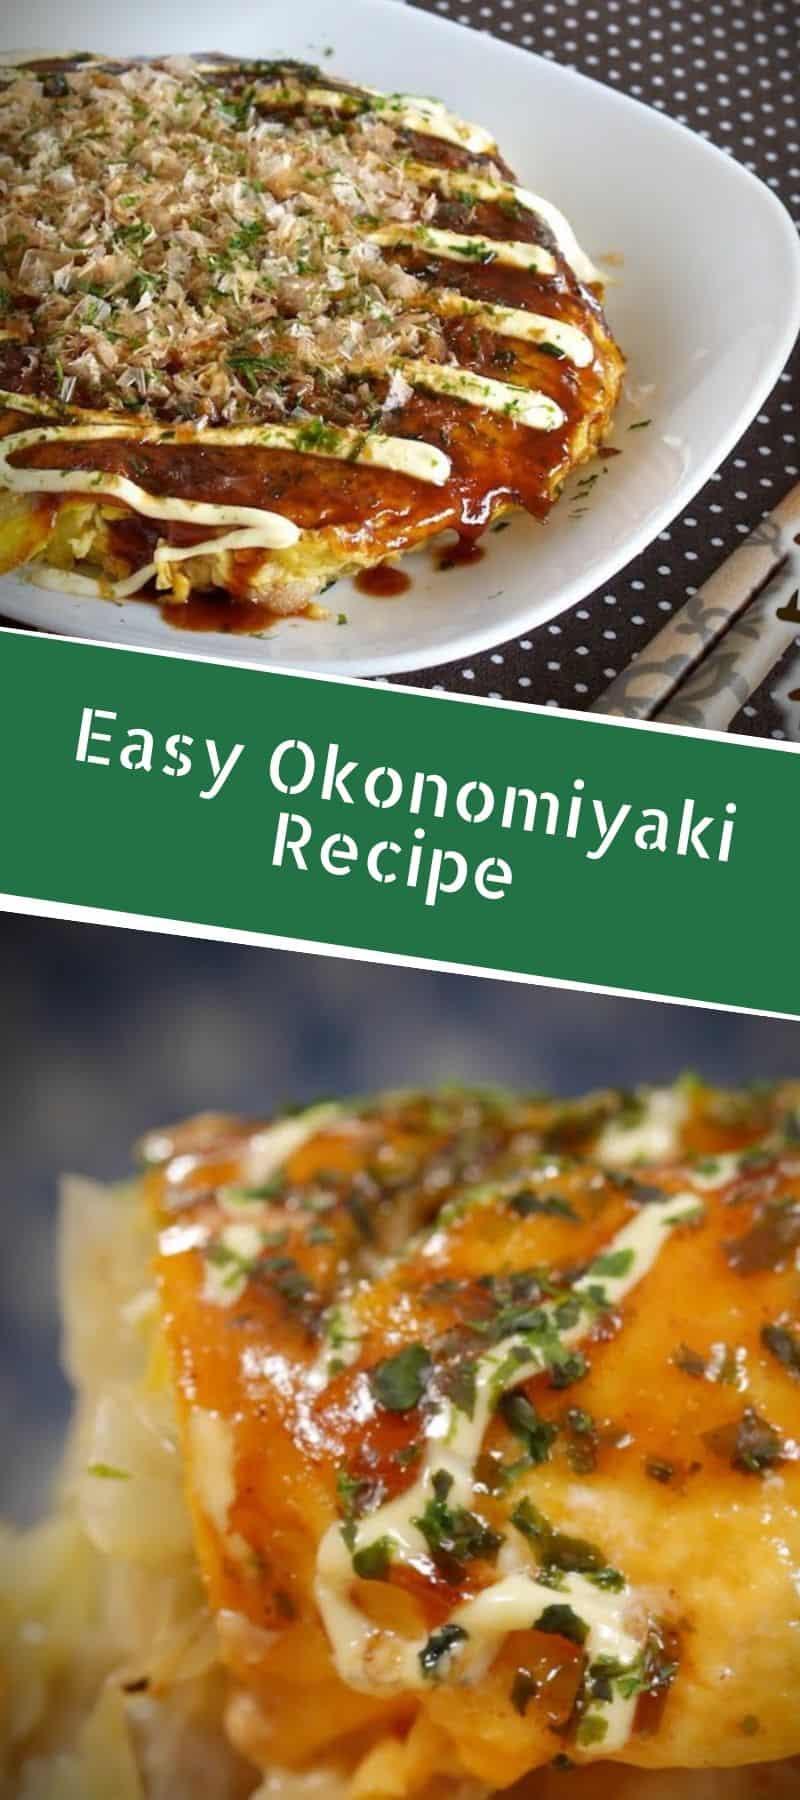 Easy Okonomiyaki Recipe 3